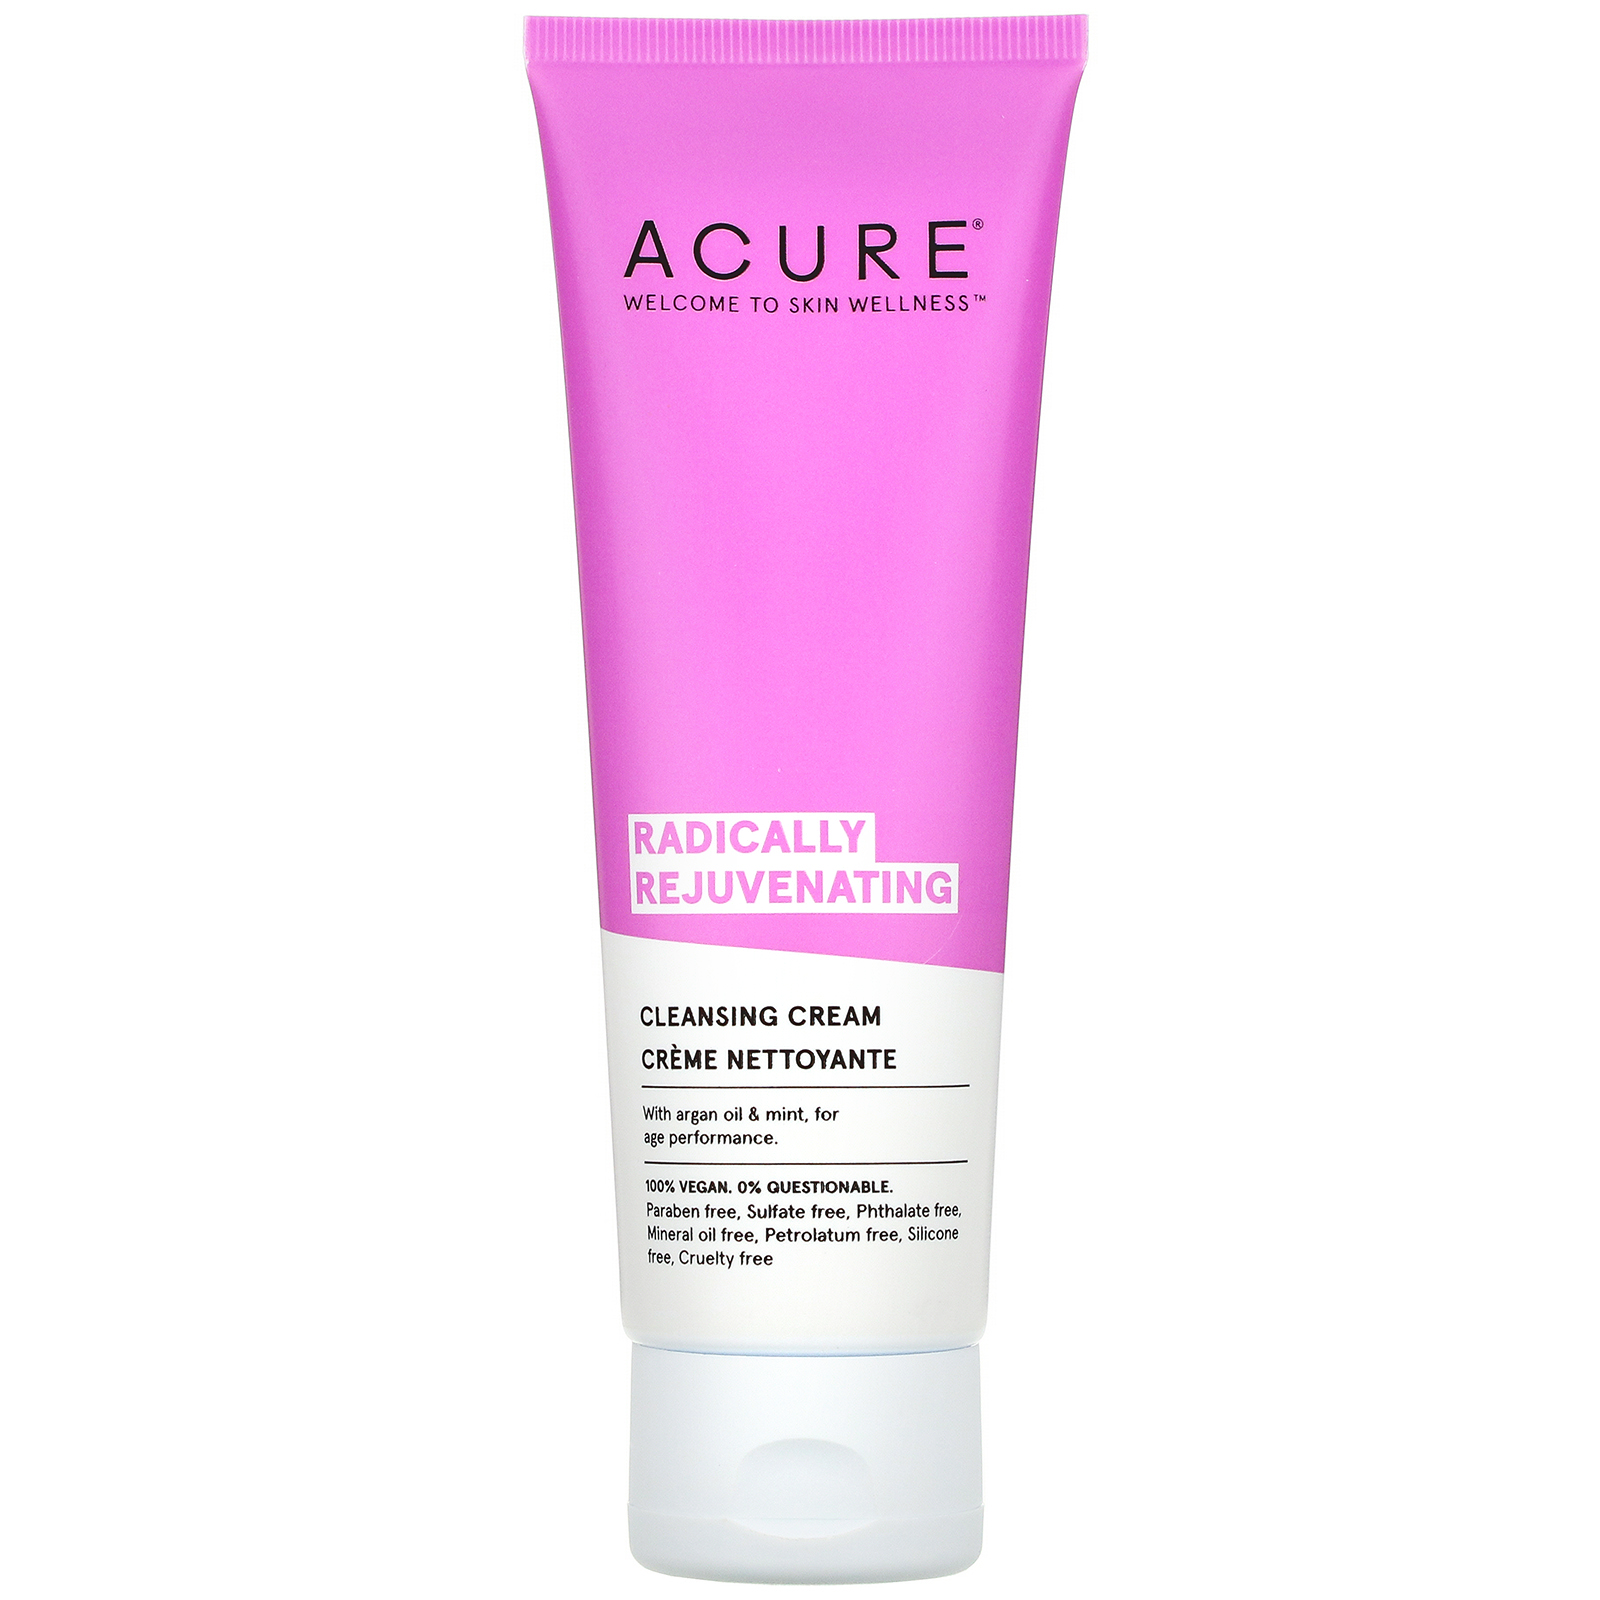 Radically Rejuvenating Cleansing Cream, 4 Fl Oz (118 Ml